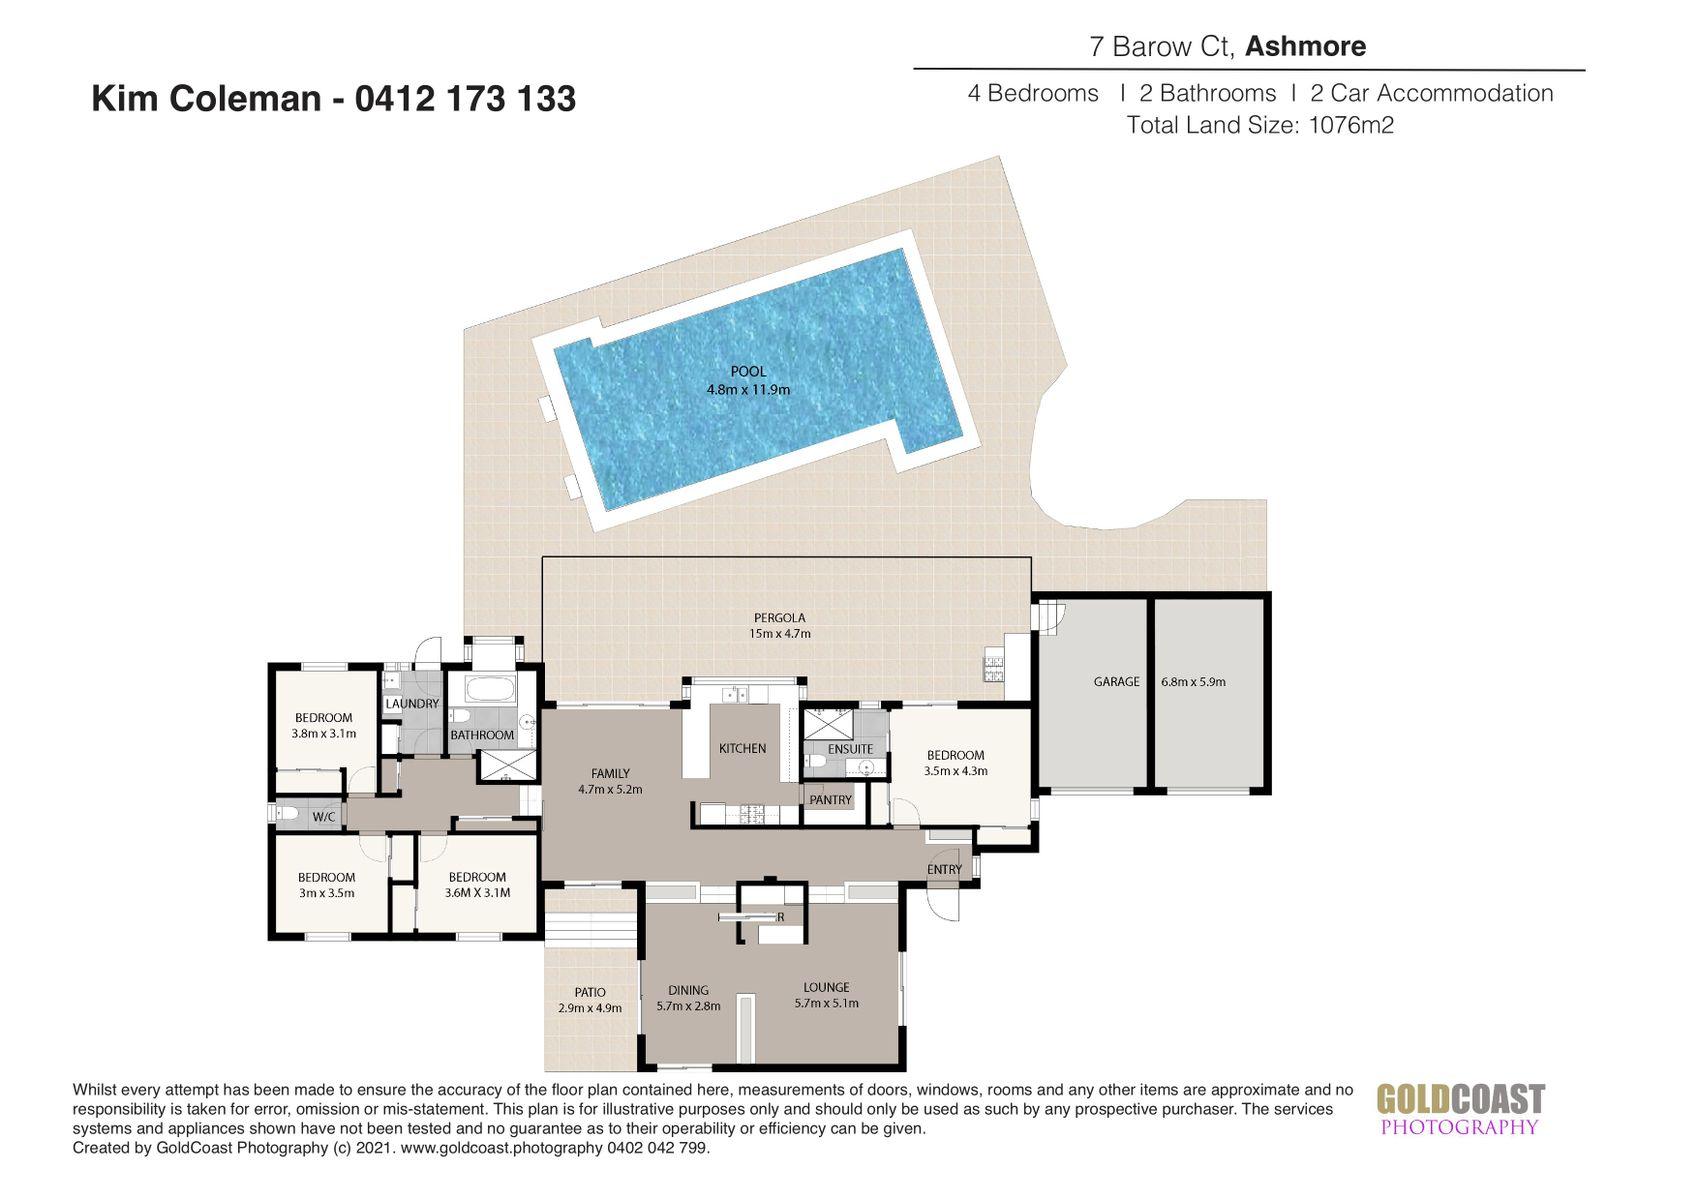 7 Barow Court, Ashmore, QLD 4214